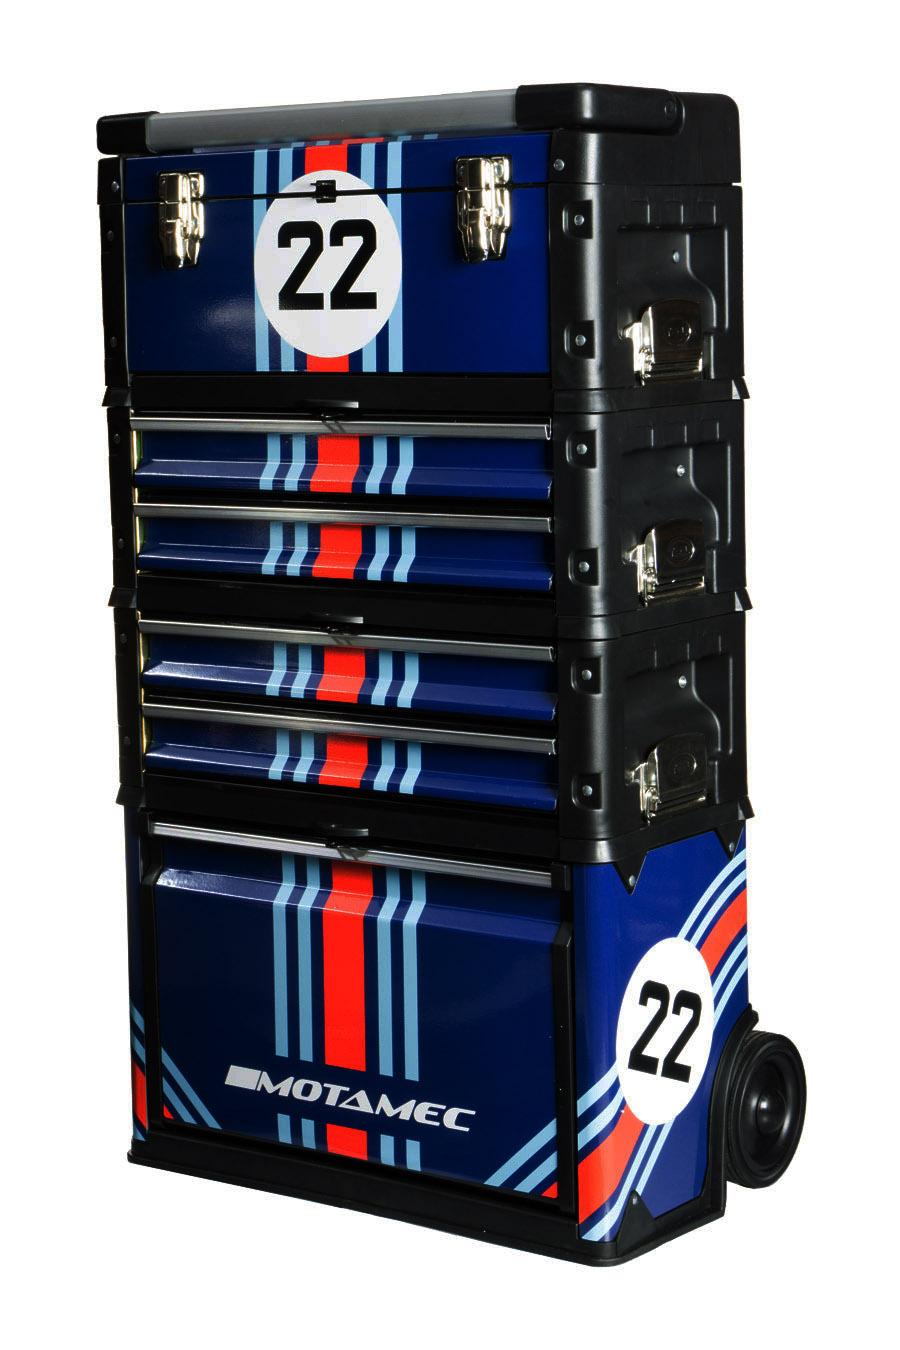 Motamec Modular Tool Box Trolley Mobile Cart Cabinet Chest